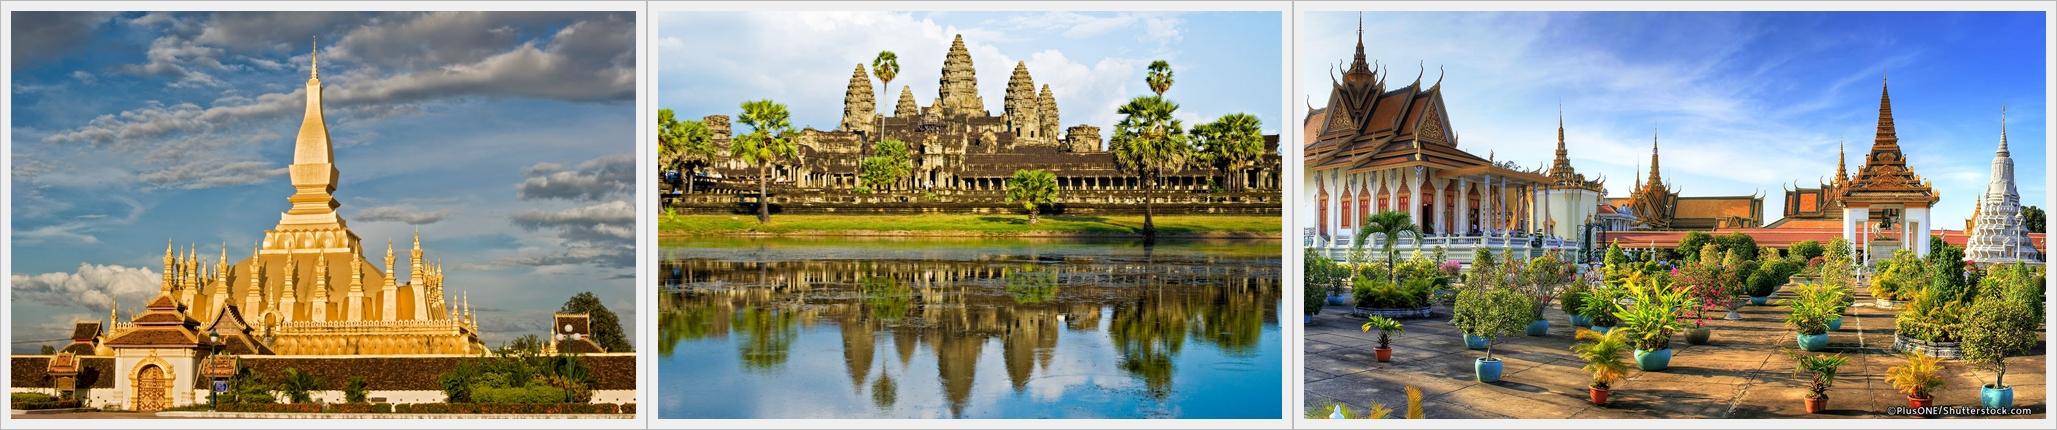 du-lich-da-nang-savanakhet-siemriep-phnompenh